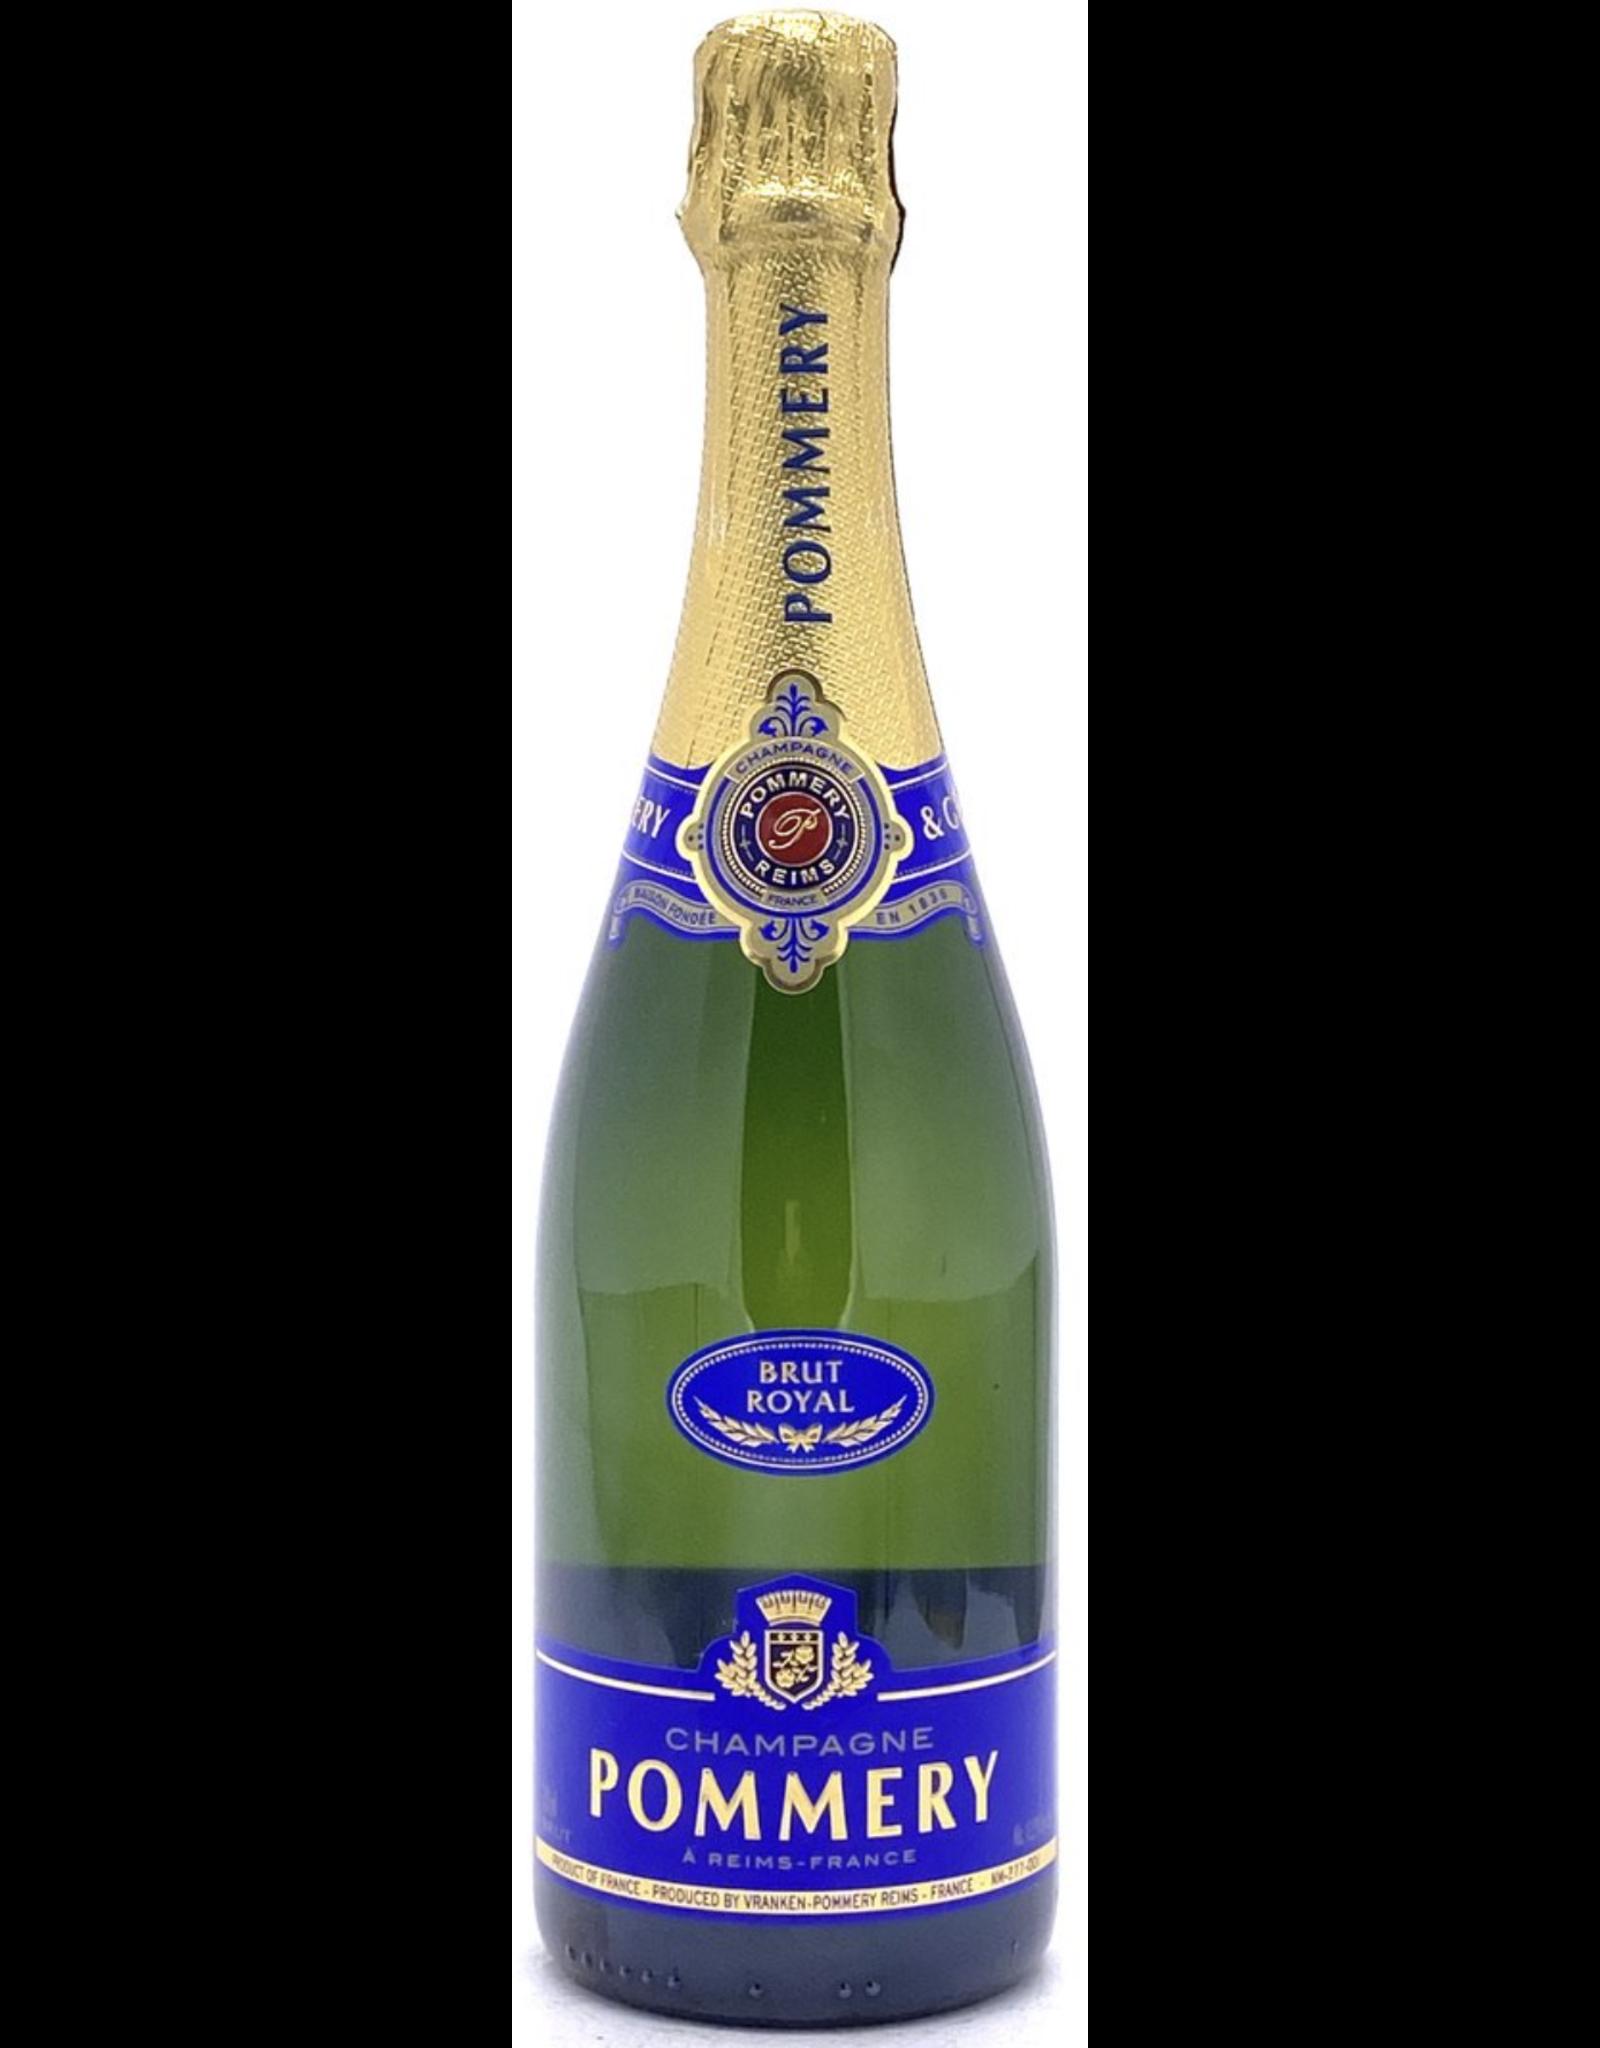 Pommery Pommery Brut Royal, Champagne NV